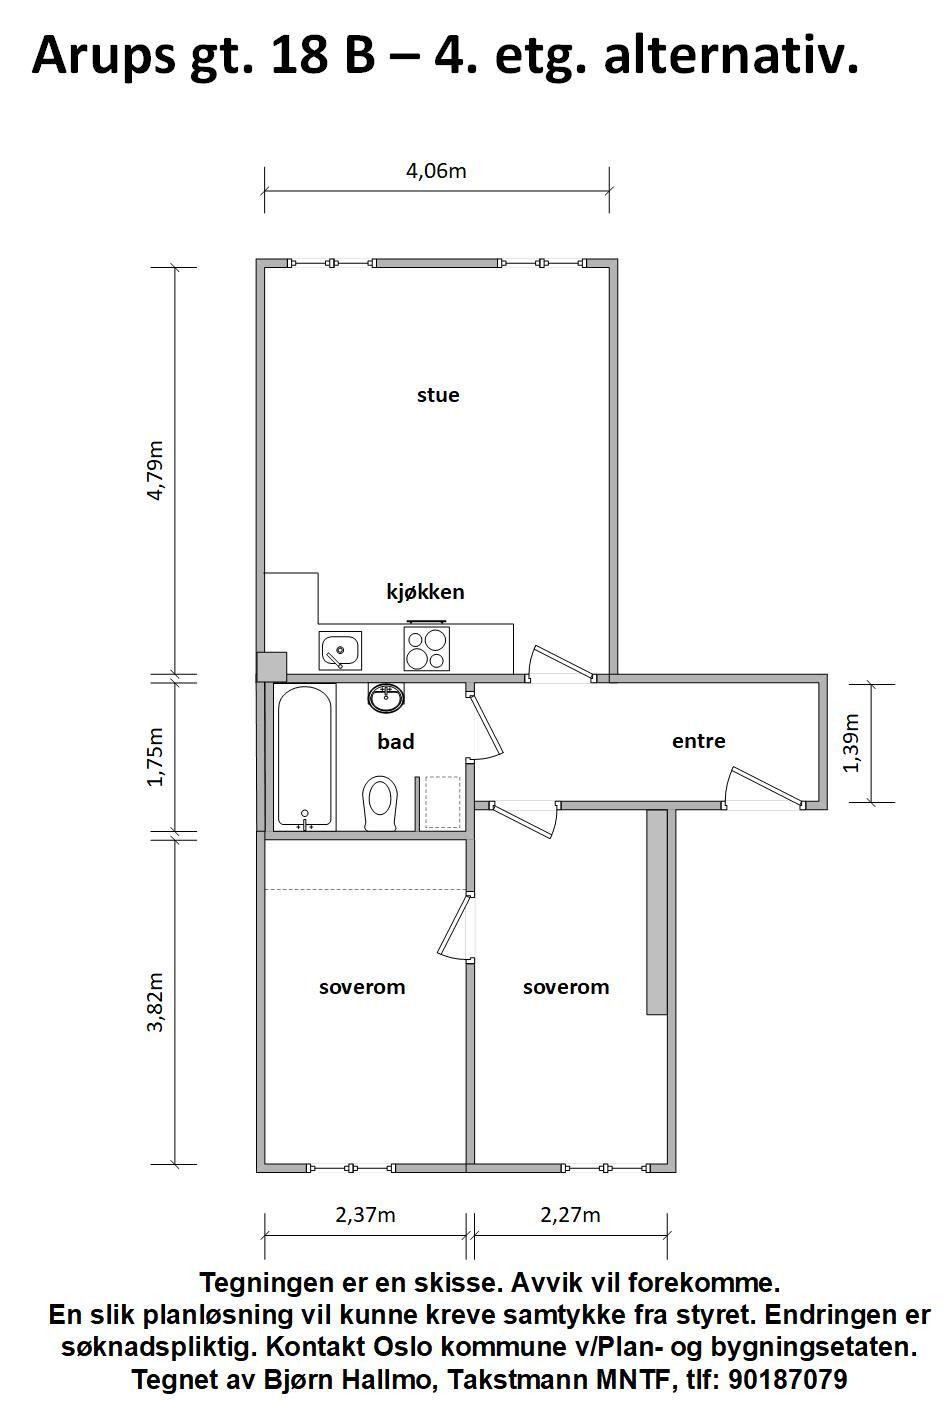 Arups gate 18 B - Alternativ plantegning som 3-roms -